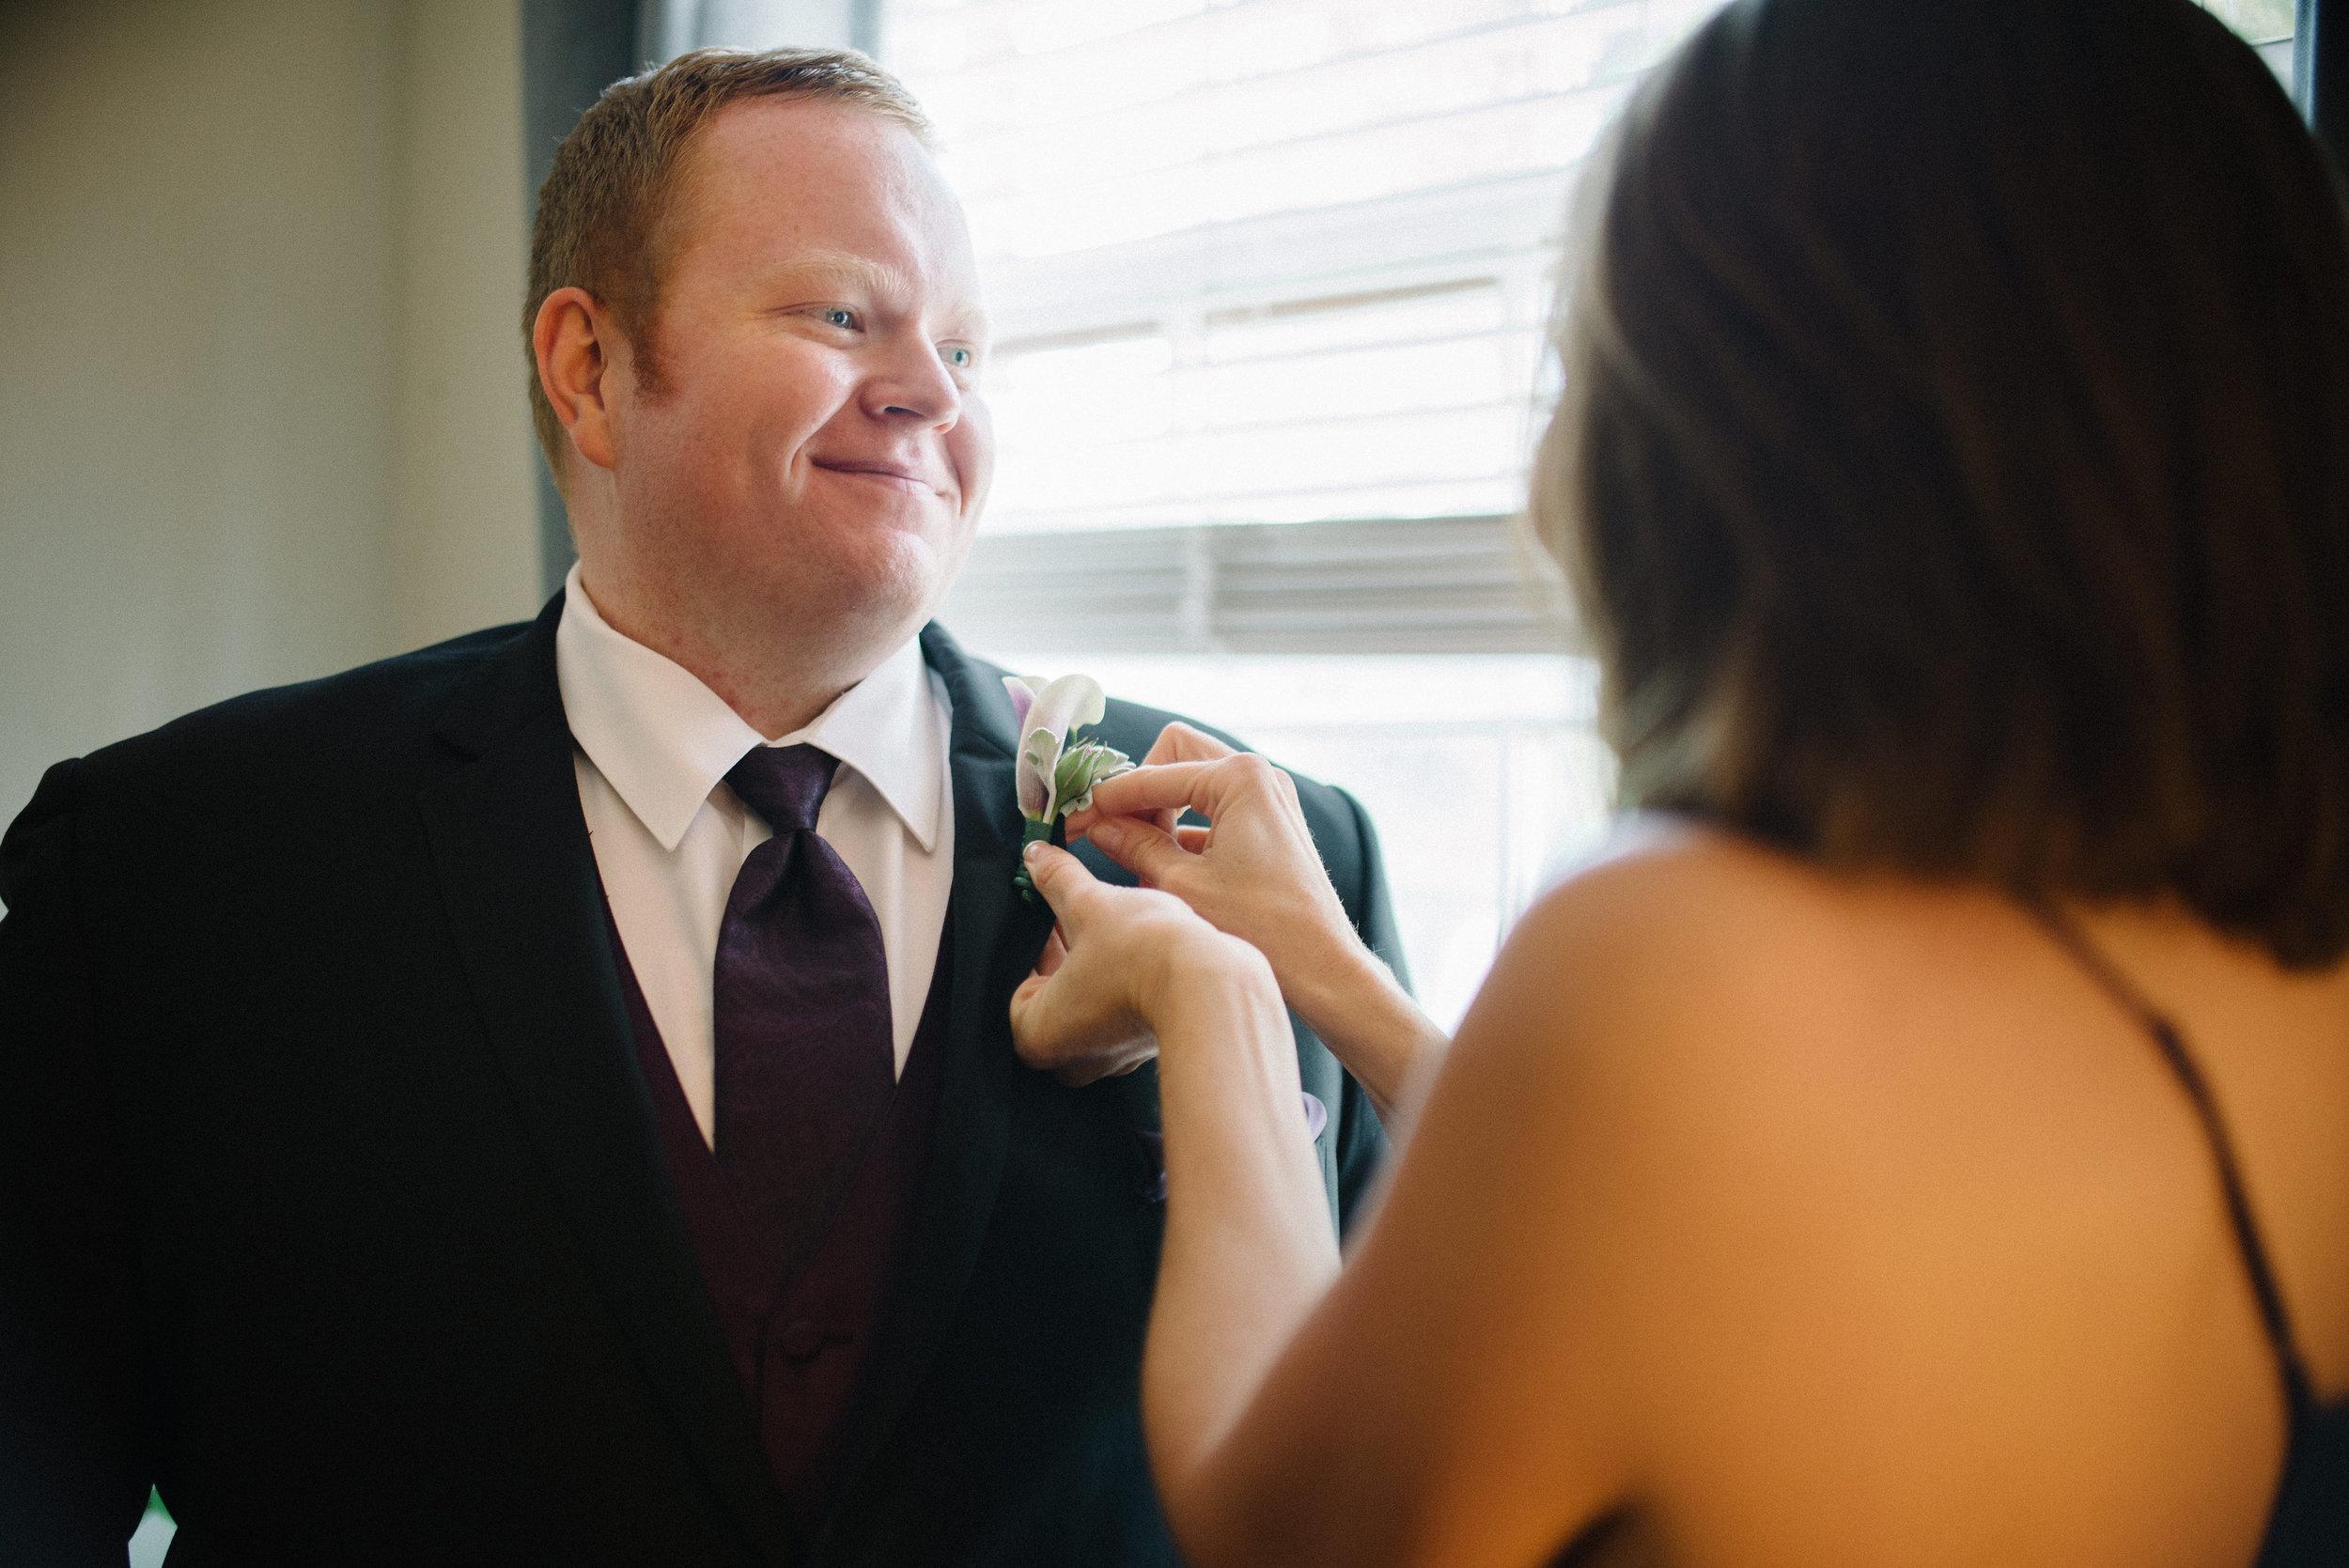 groom-boutonniere.jpg